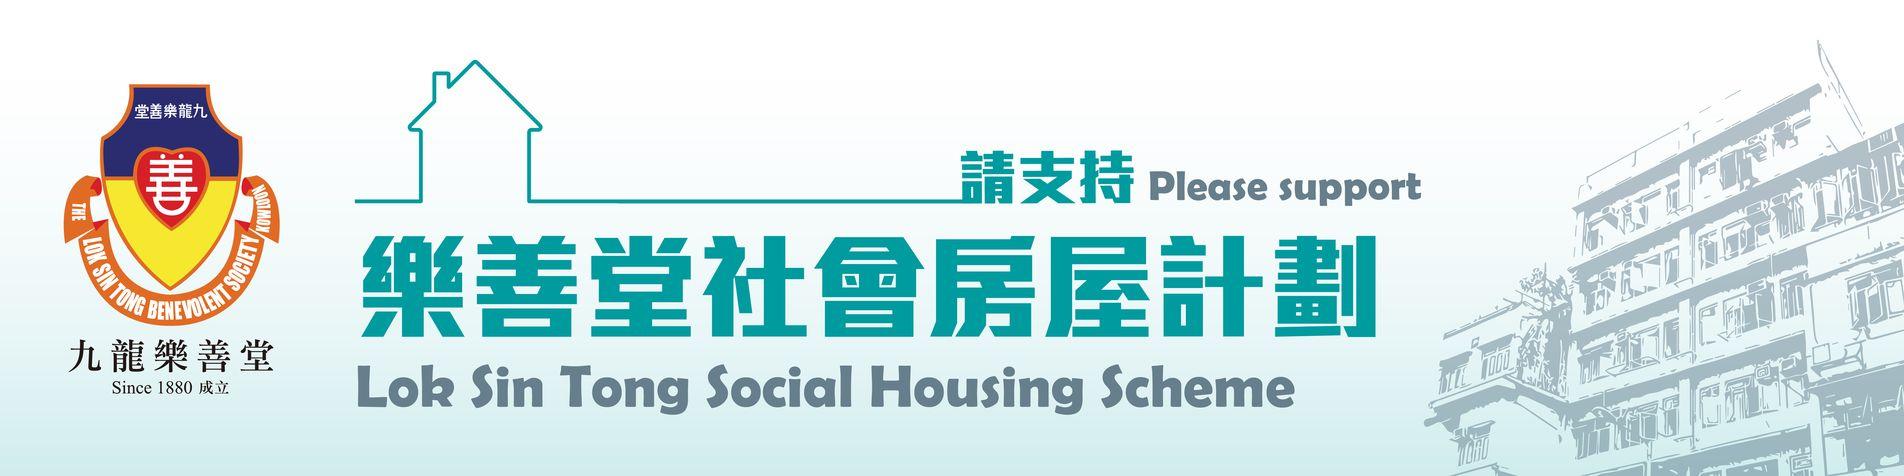 Fund-raising for Lok Sin Tong Social Housing Scheme